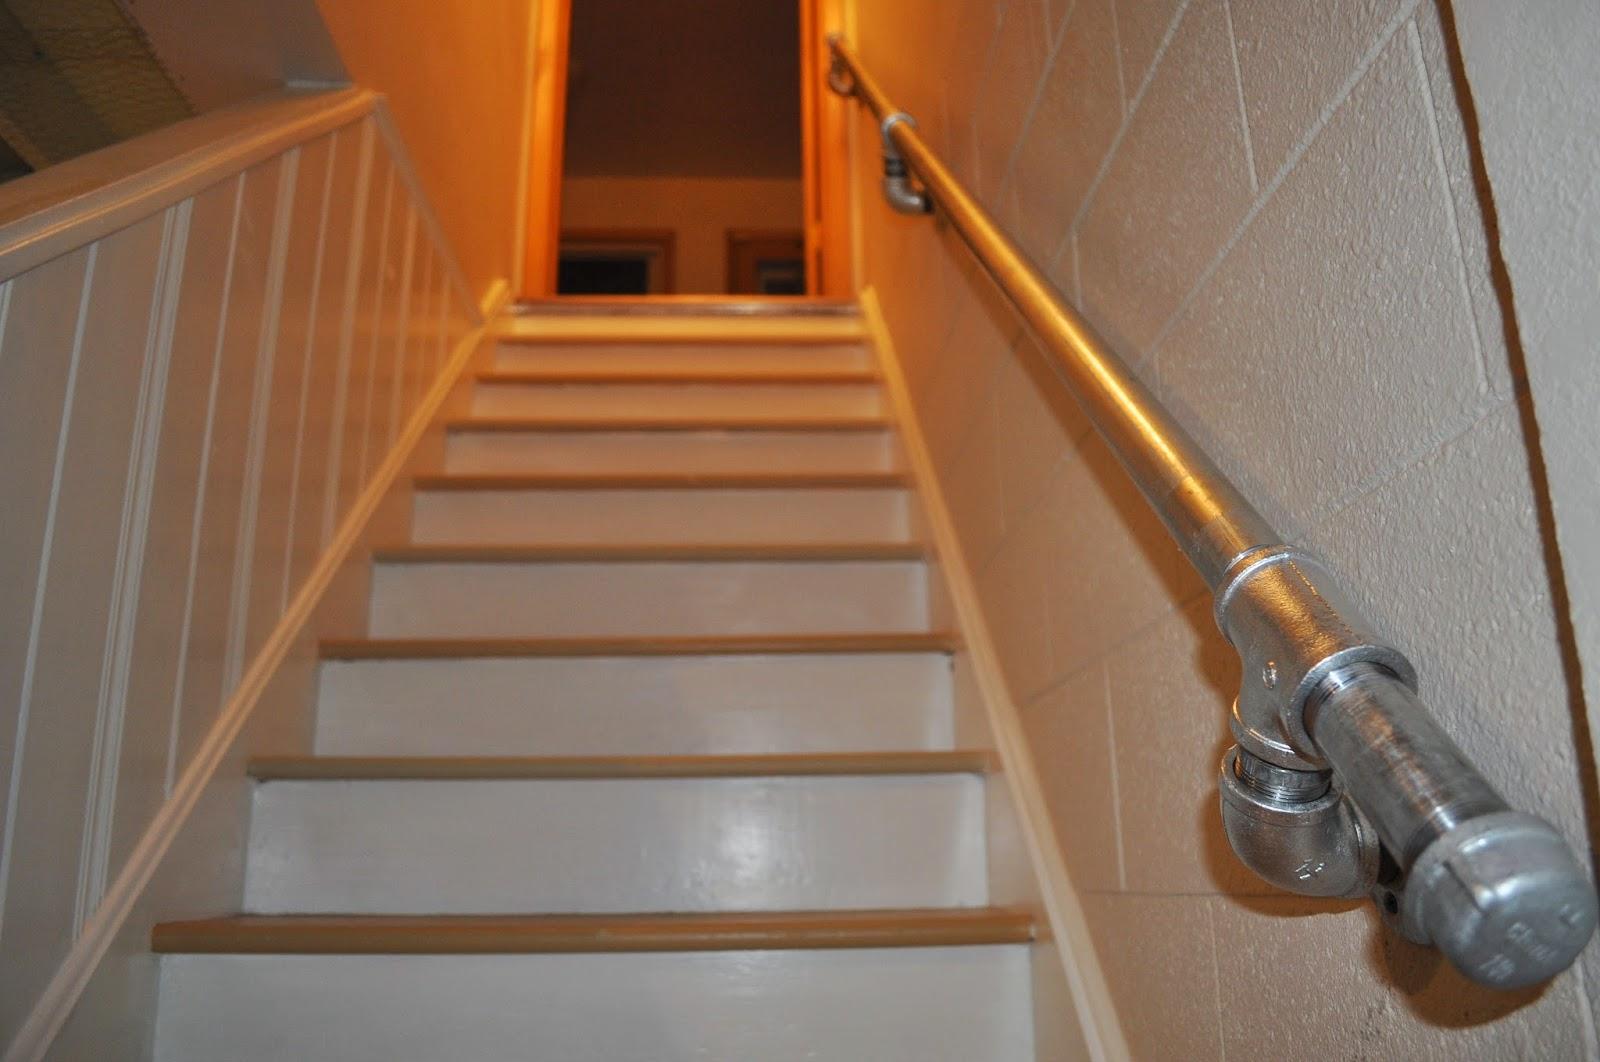 Carri Us Home: DIY Industrial Handrail